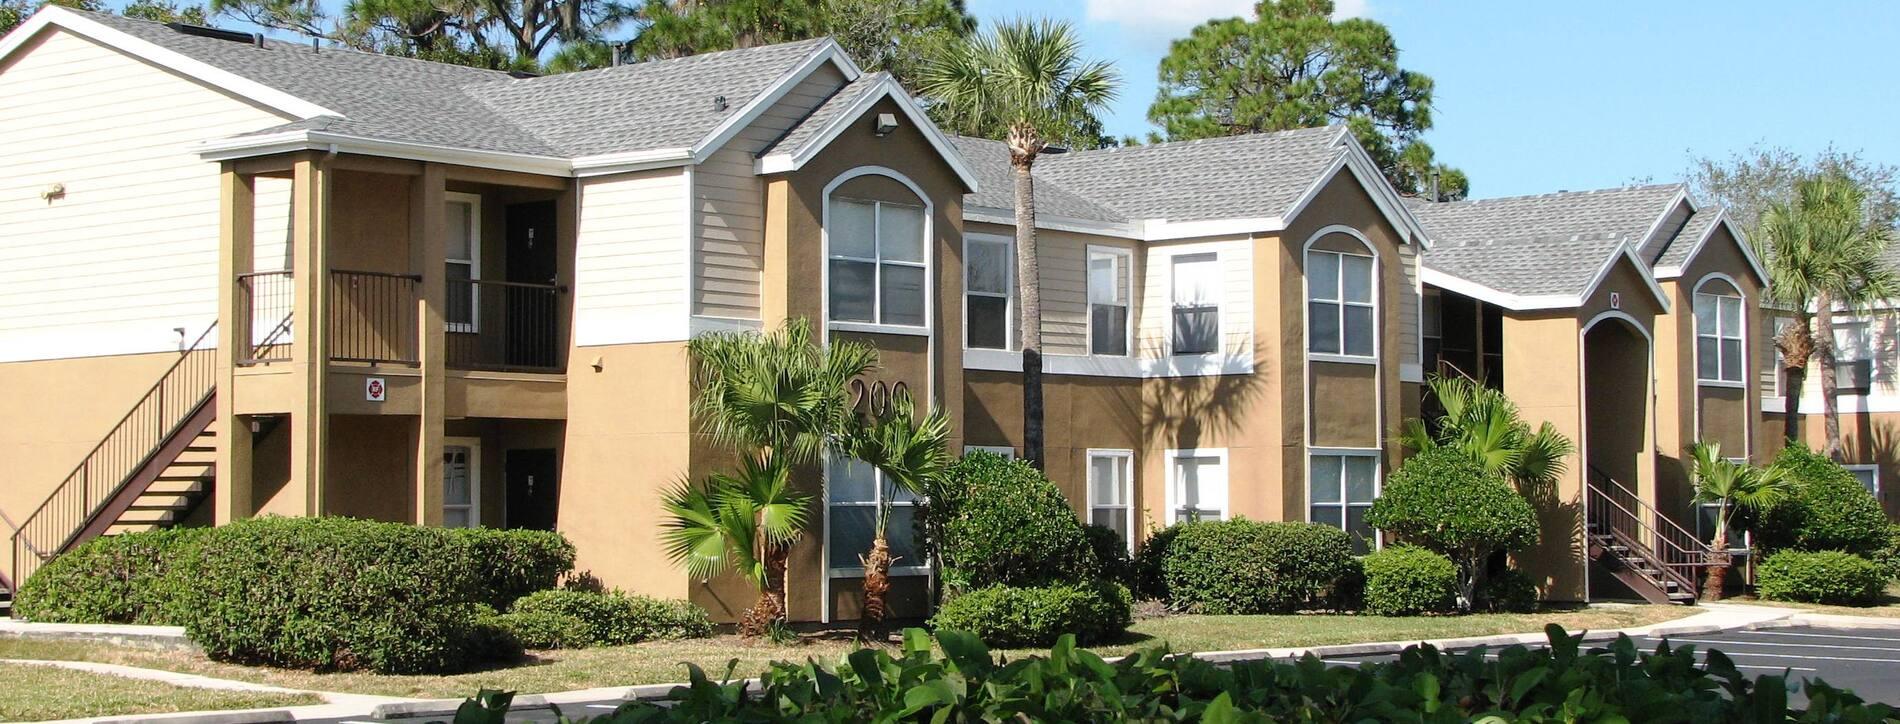 Apartments for Rent in Bradenton FL Eden Pointe Home